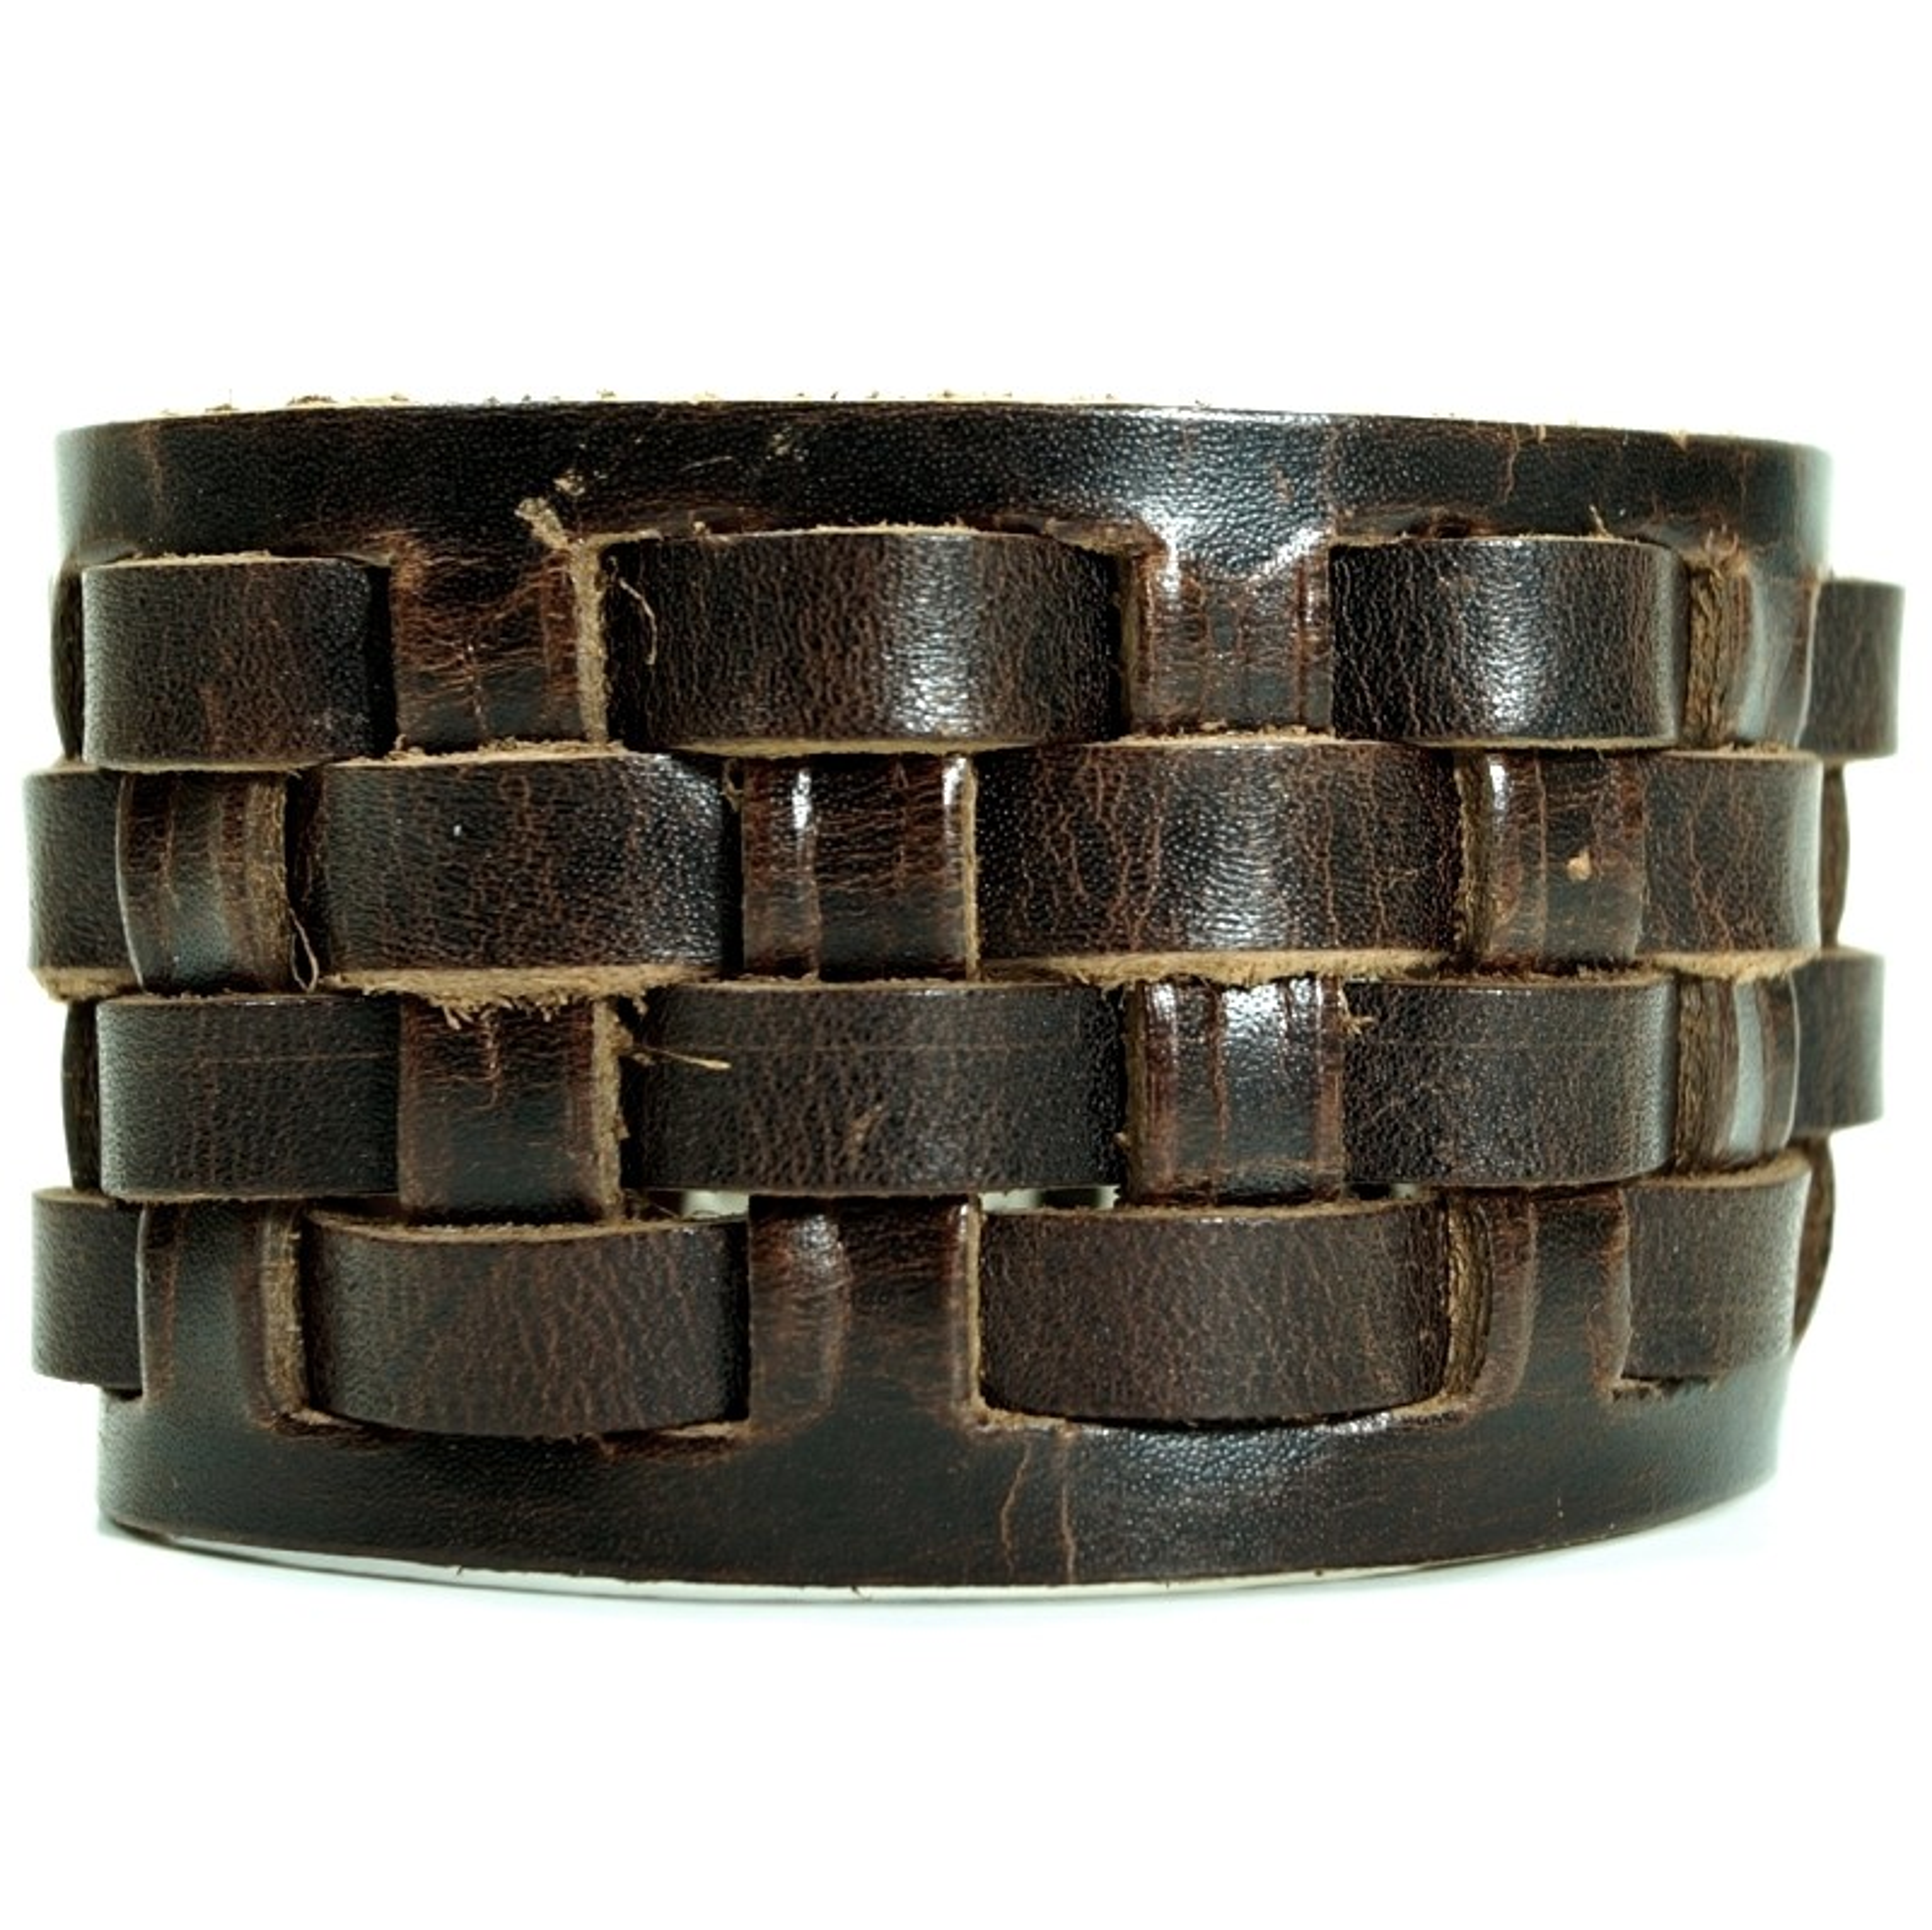 CJBB1951 Herren Armband Leder braun 20,5 cm